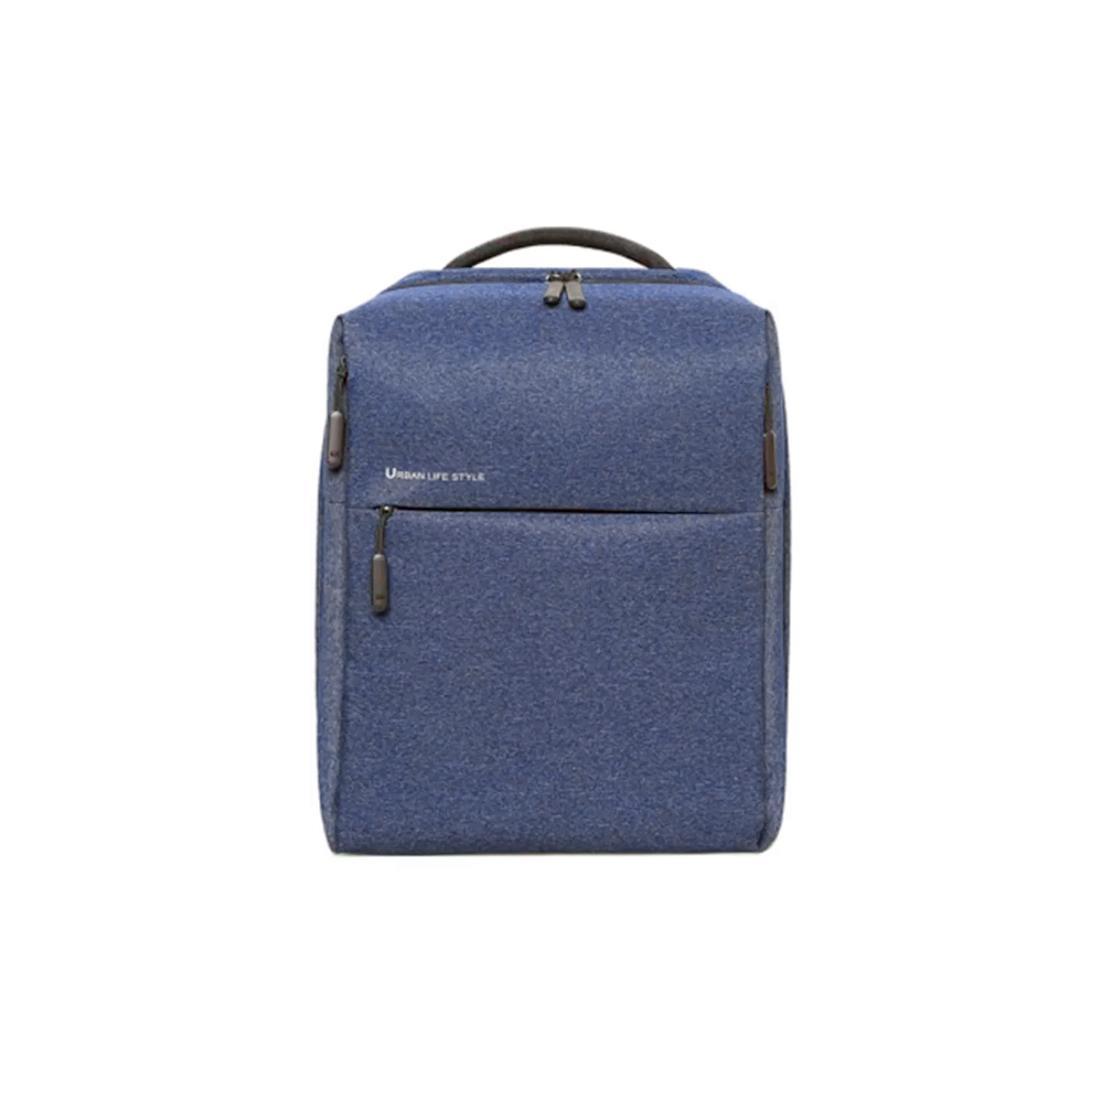 Рюкзак Xiaomi Urban Life Style Backpack (ZJB4068GL) для Apple MacBook темно-синий